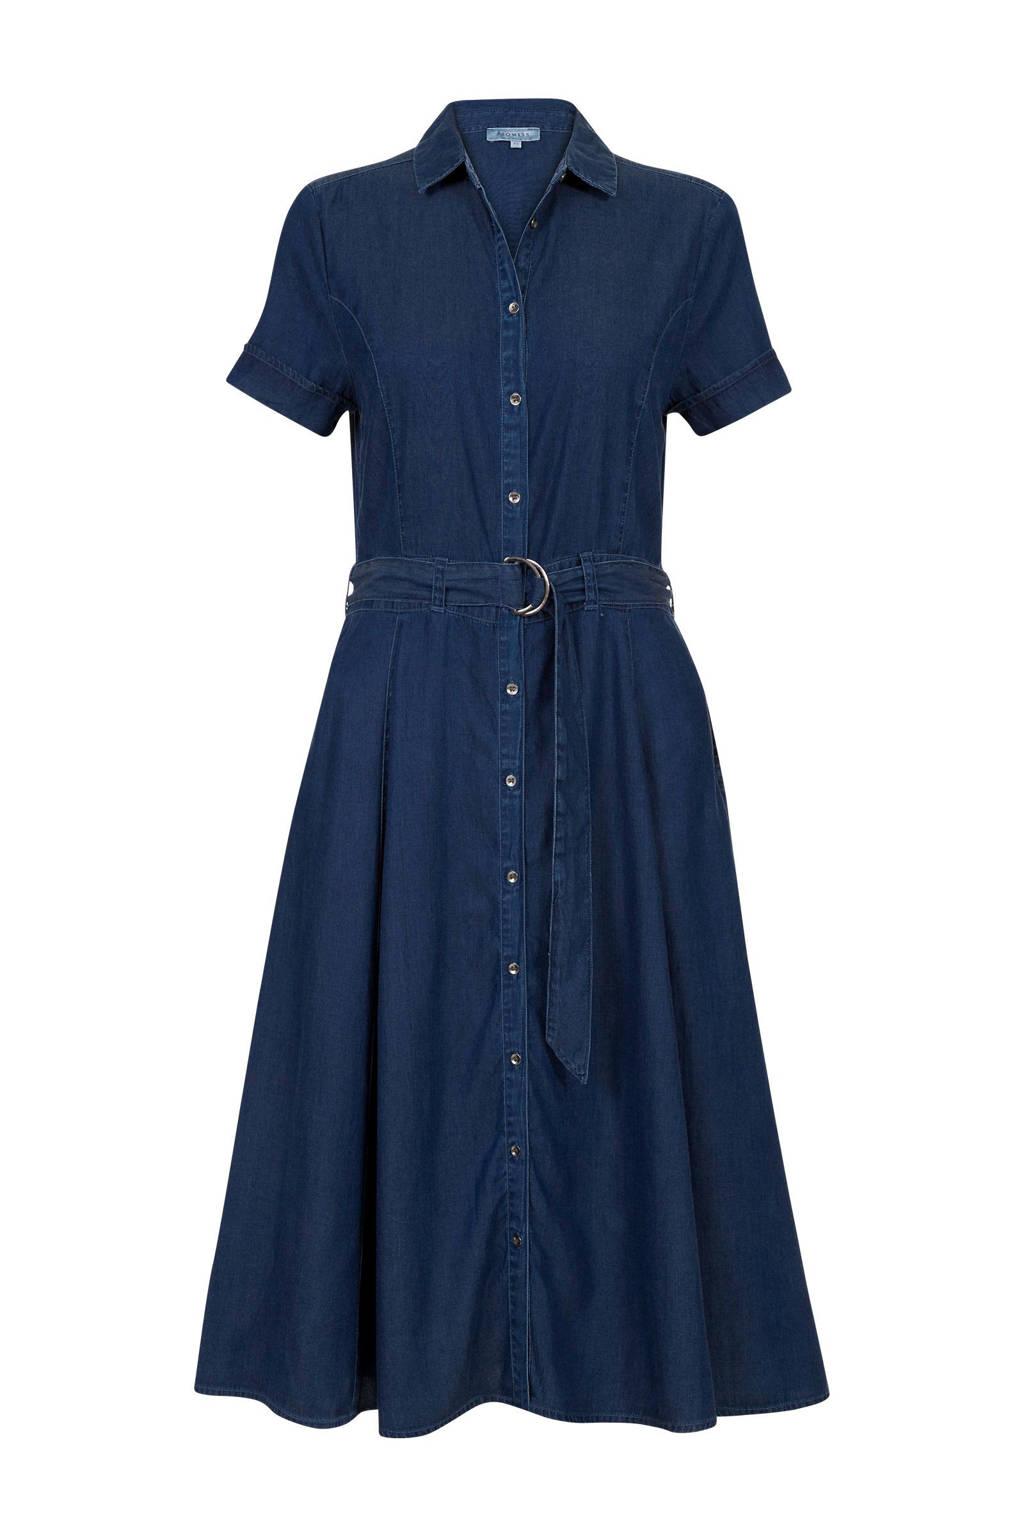 Promiss blousejurk met ceintuur donkerblauw, Donkerblauw